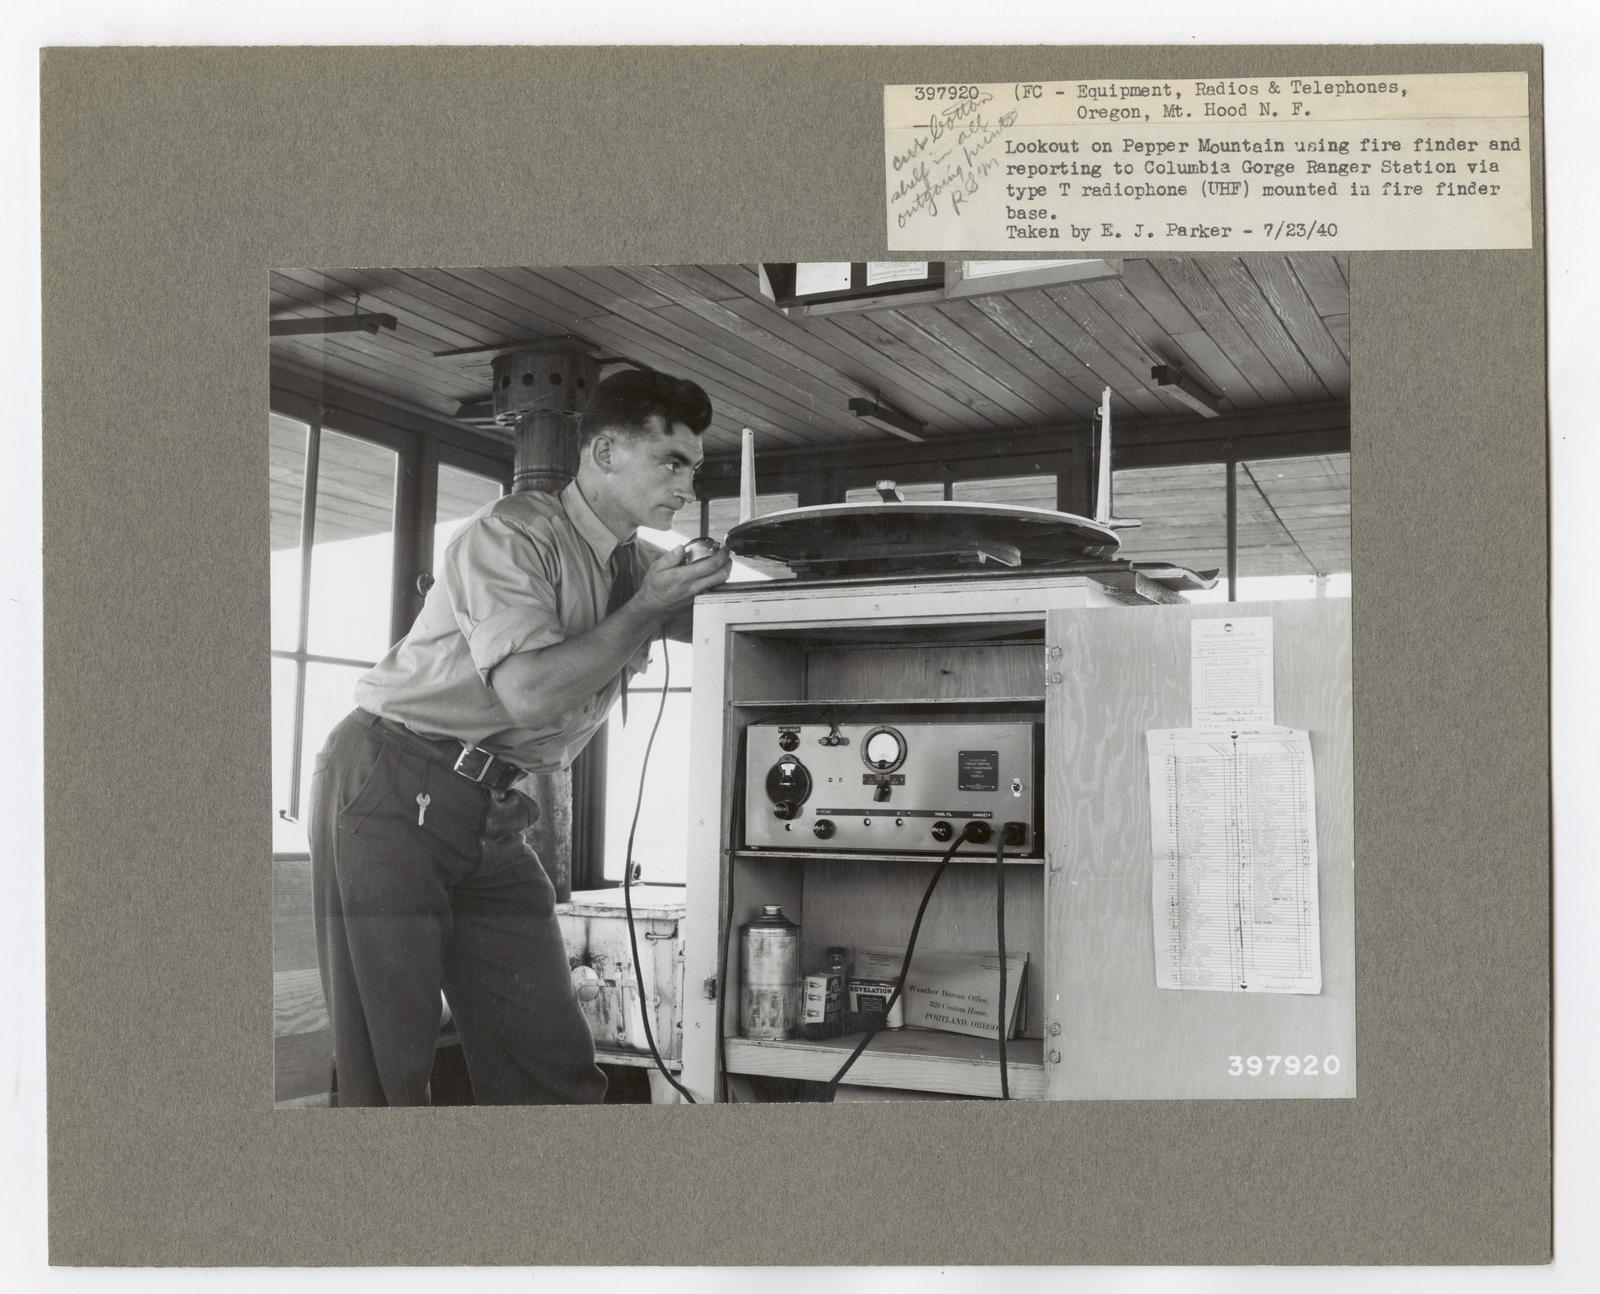 Communications: Radios - Oregon